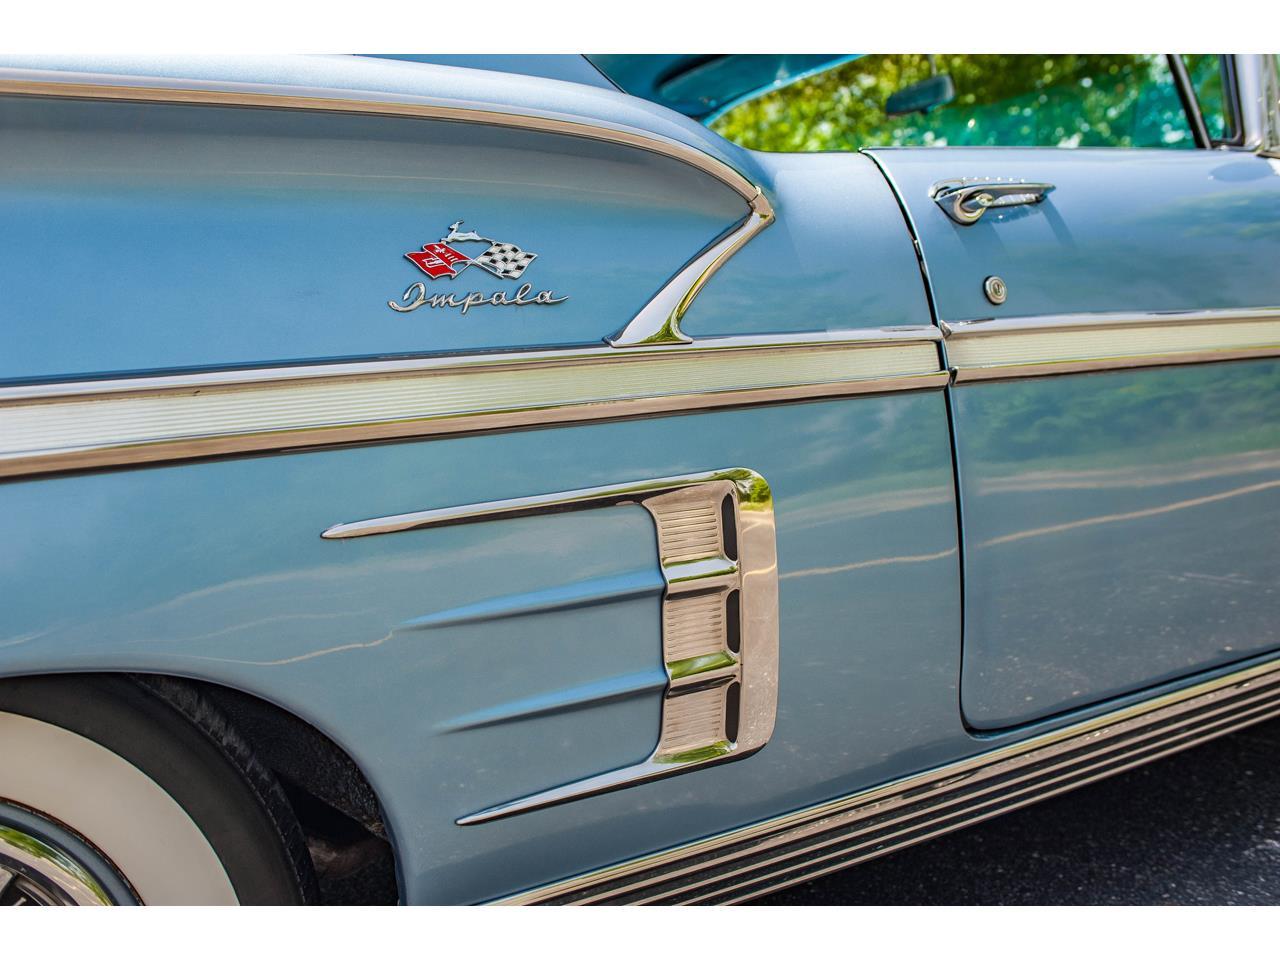 Large Picture of Classic 1958 Chevrolet Impala - $62,000.00 - QB9Q